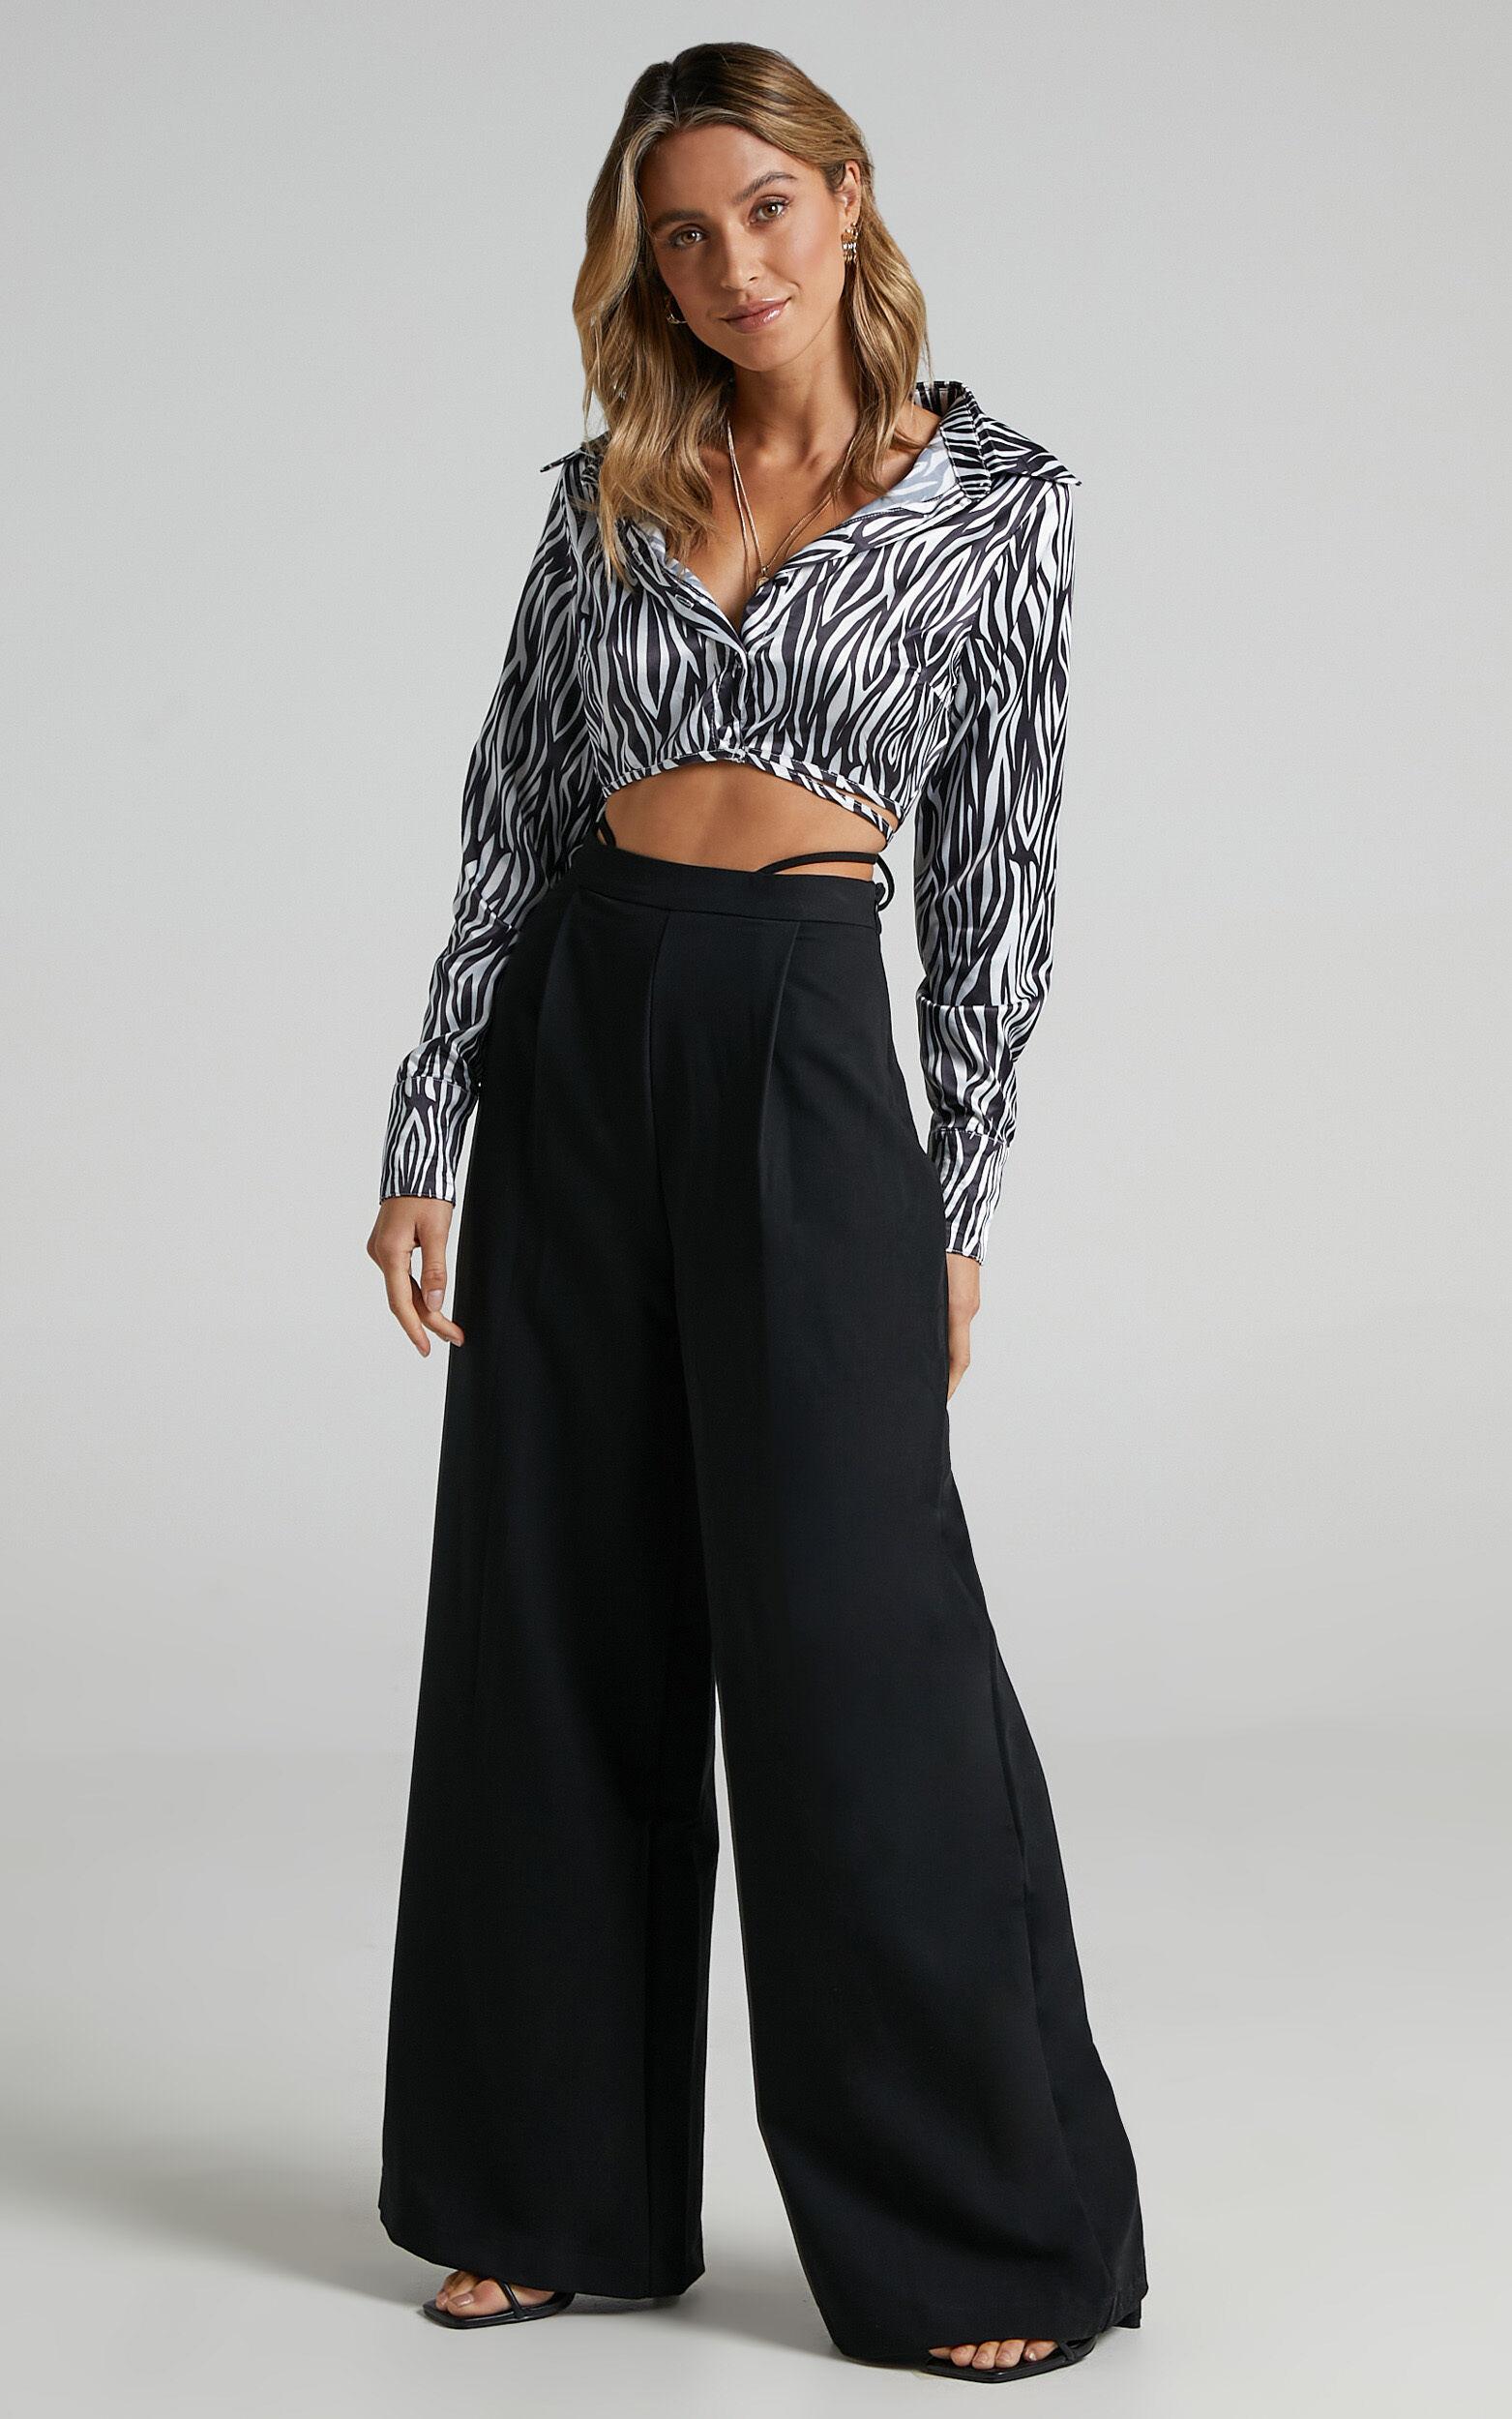 Catie Tie Waist Detail Pants in Black - 06, BLK1, super-hi-res image number null